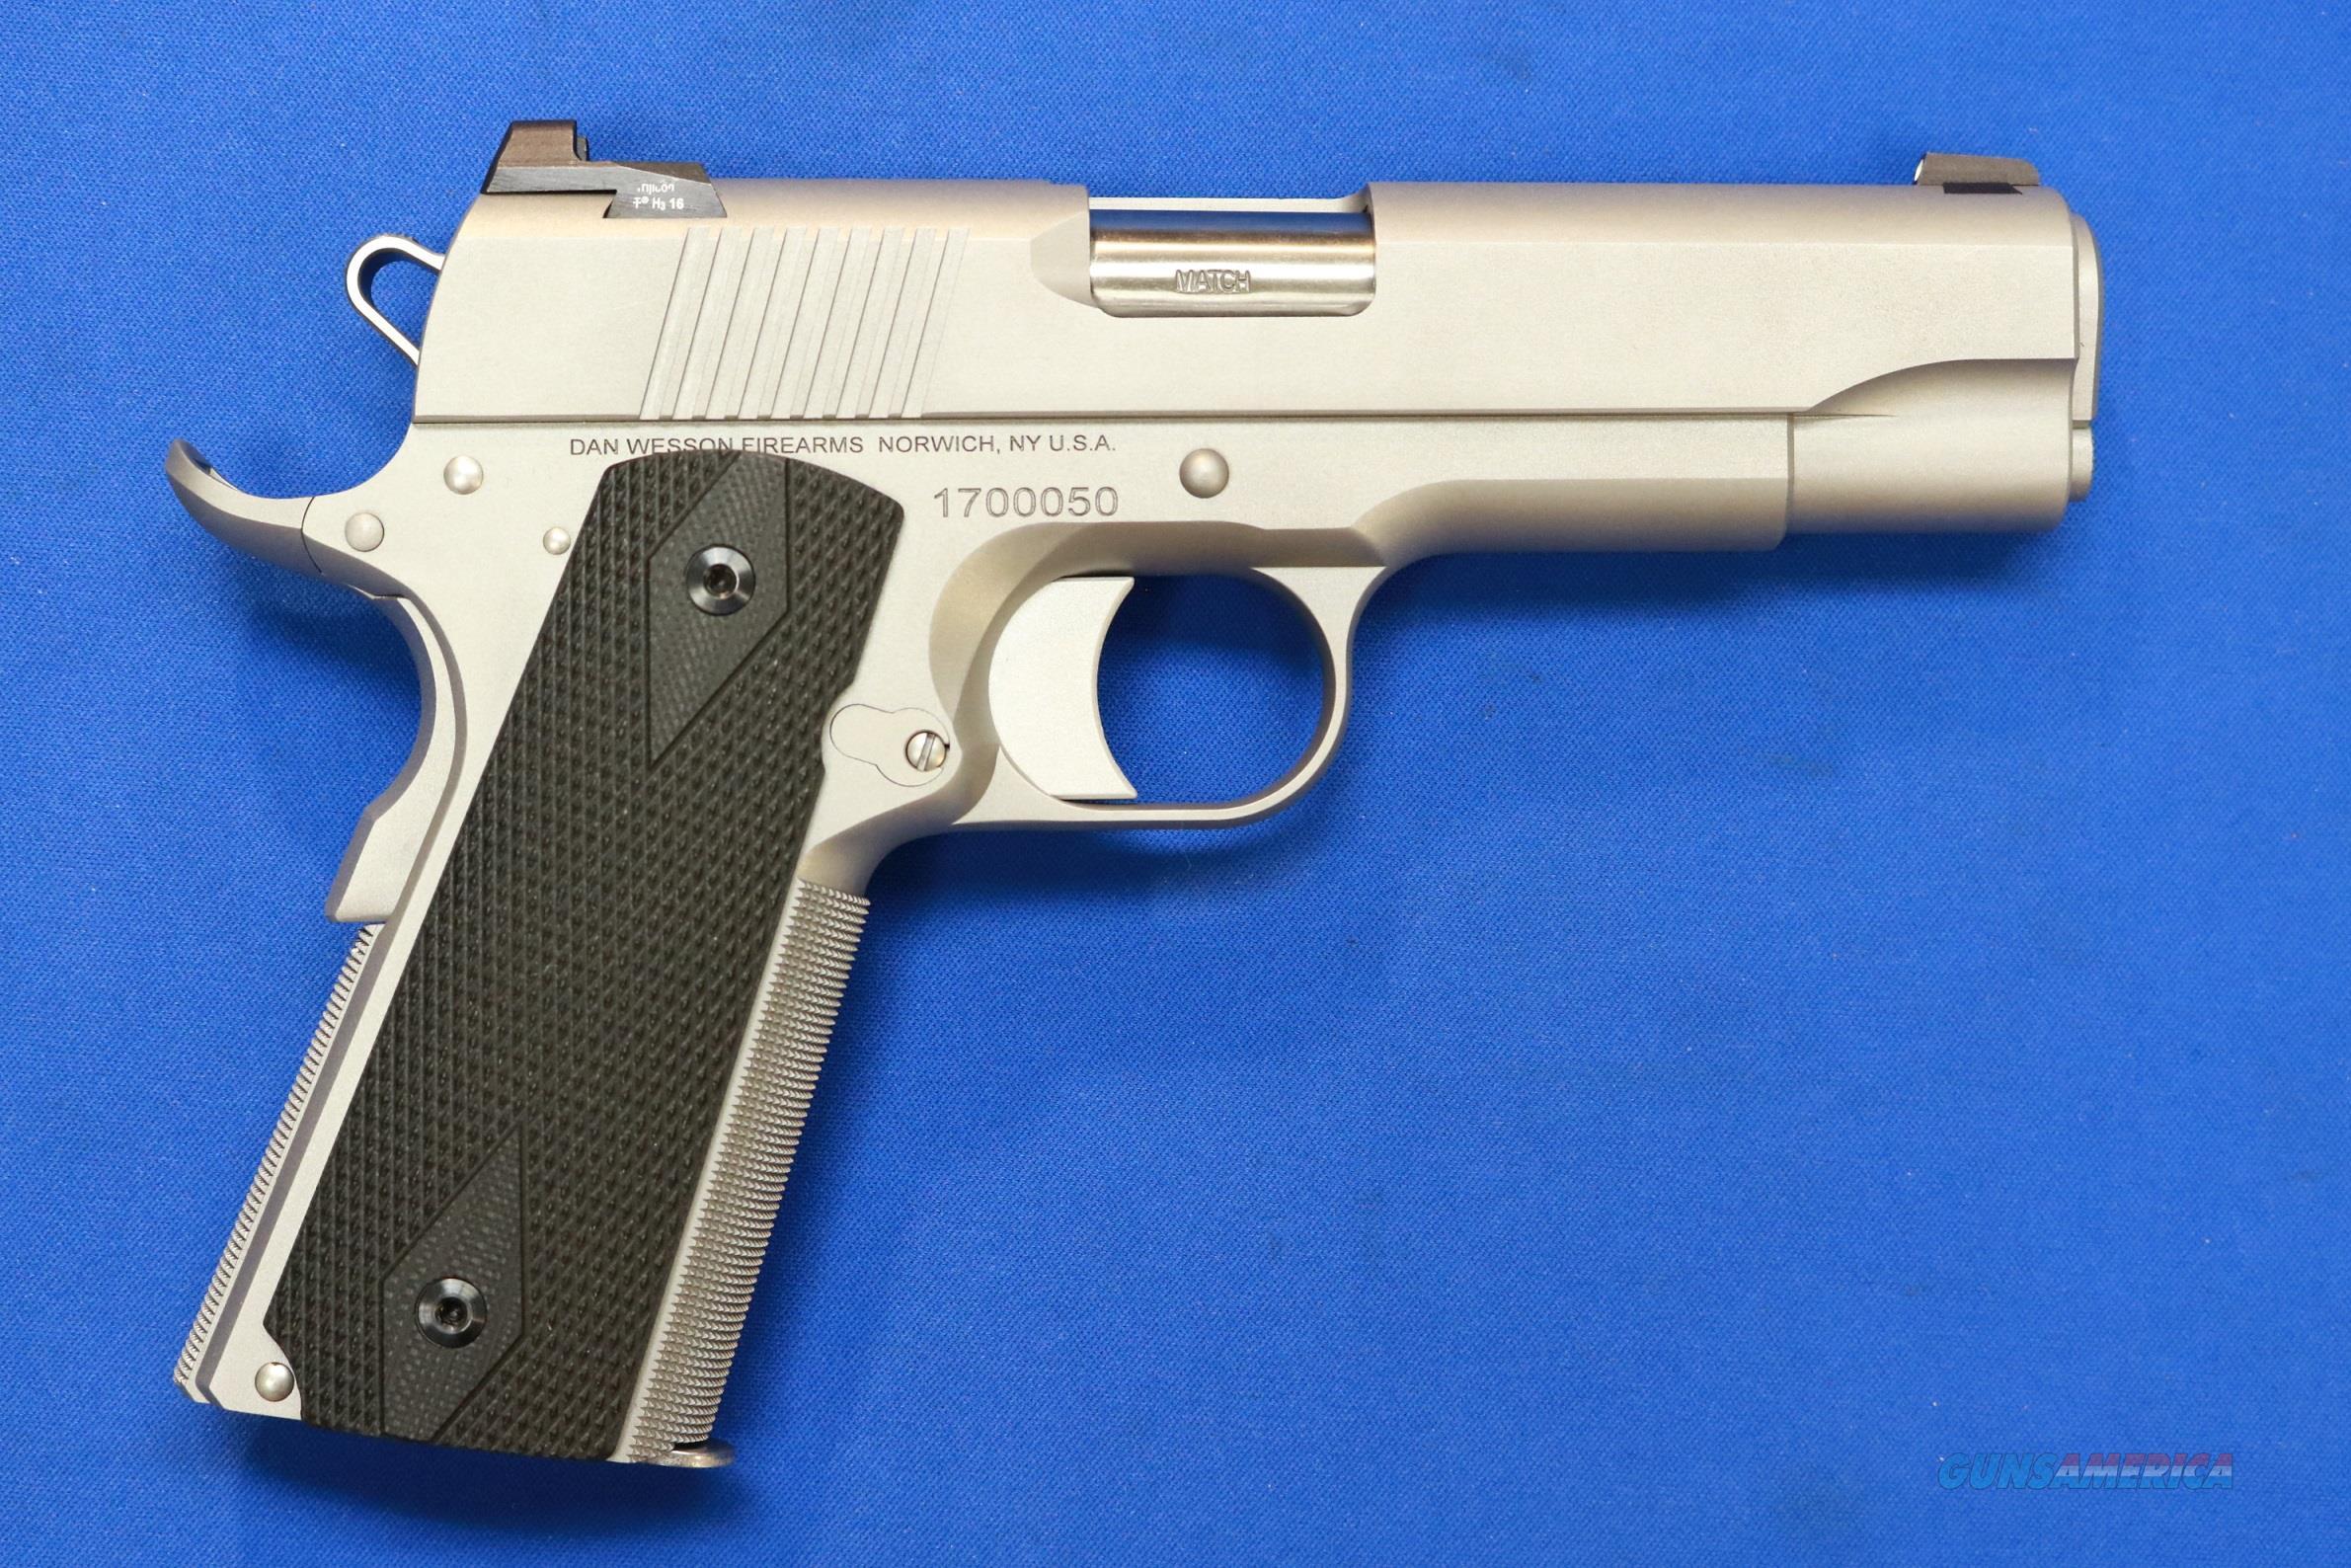 DAN WESSON 1911 VALOR STAINLESS 9mm TEXAS ENGRAVED  Guns > Pistols > Dan Wesson Pistols/Revolvers > 1911 Style